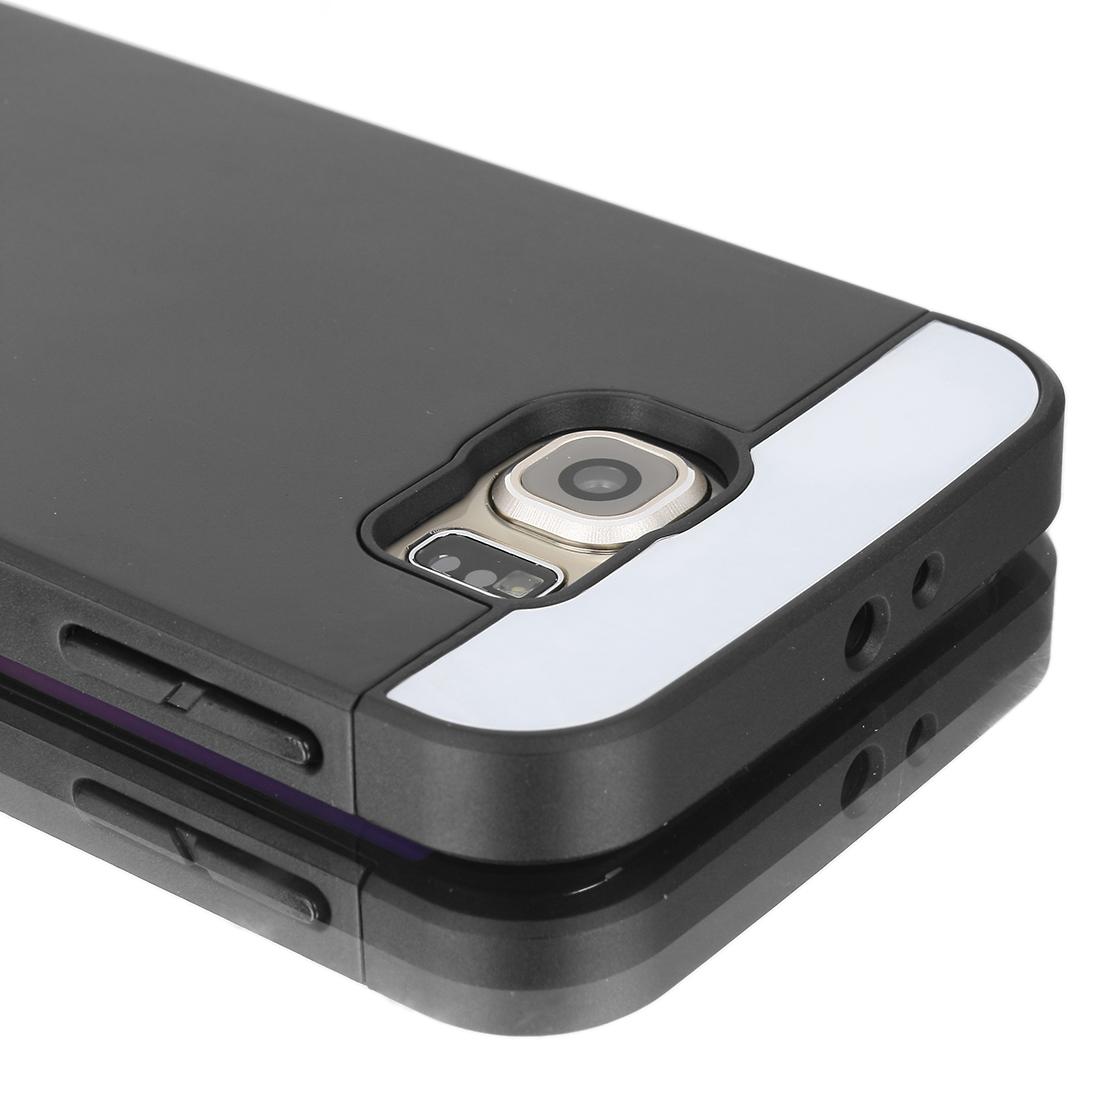 Card Pocket ShockProof Slim Hybrid Wallet Case Cover fr Galaxy S6 & Edge Black